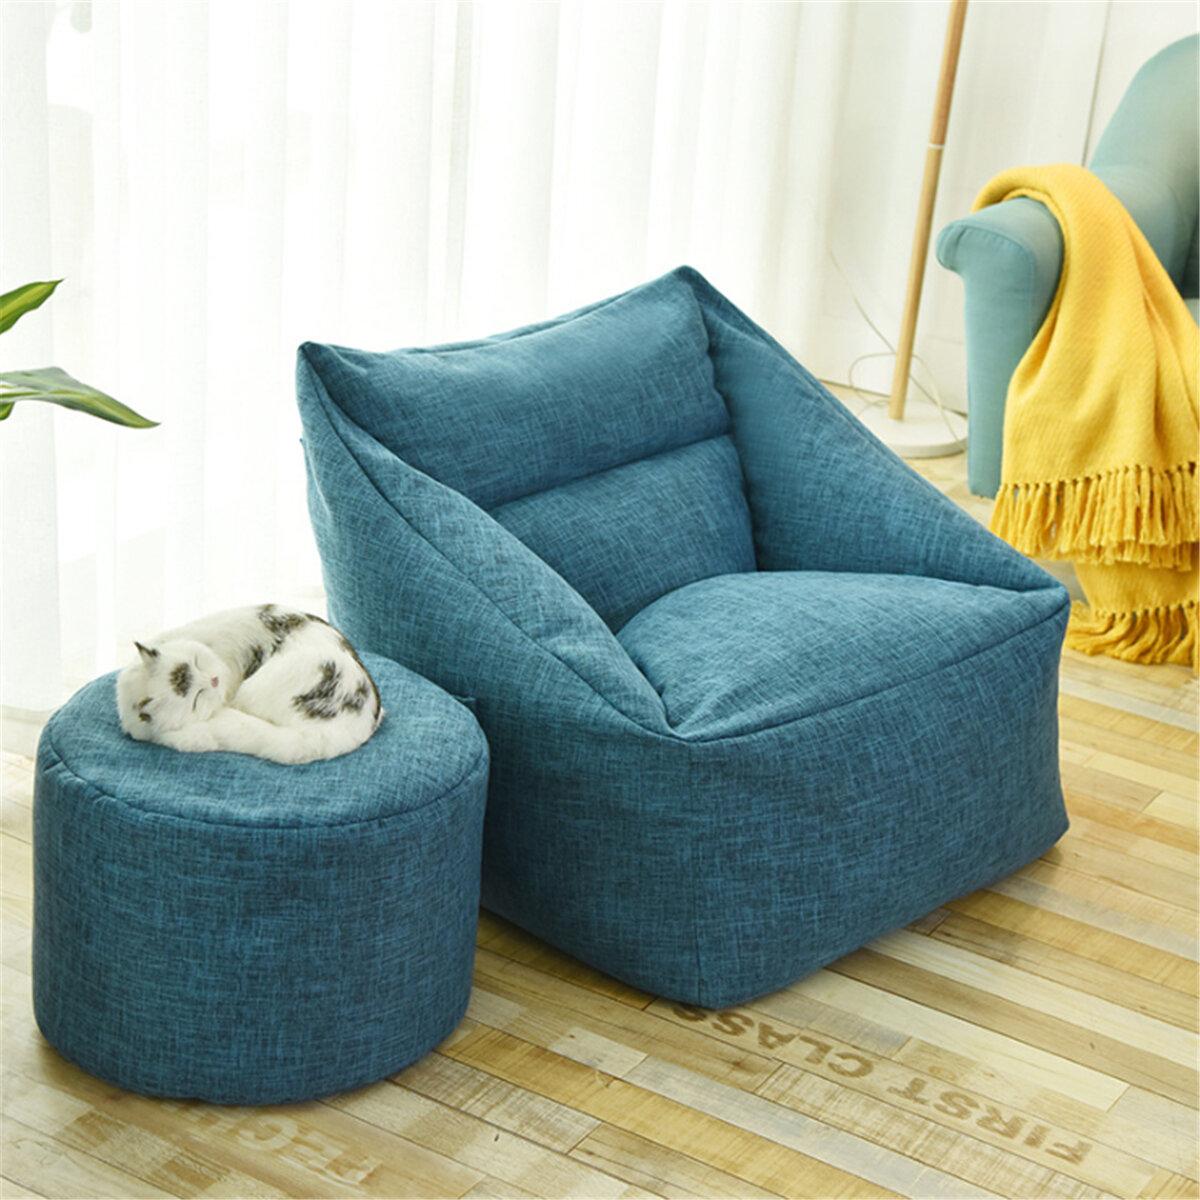 Große Sitzsack-Stuhlhussen Lazy Sofa Indoor Seat Armchair Waschbar Cosy Game Lounger